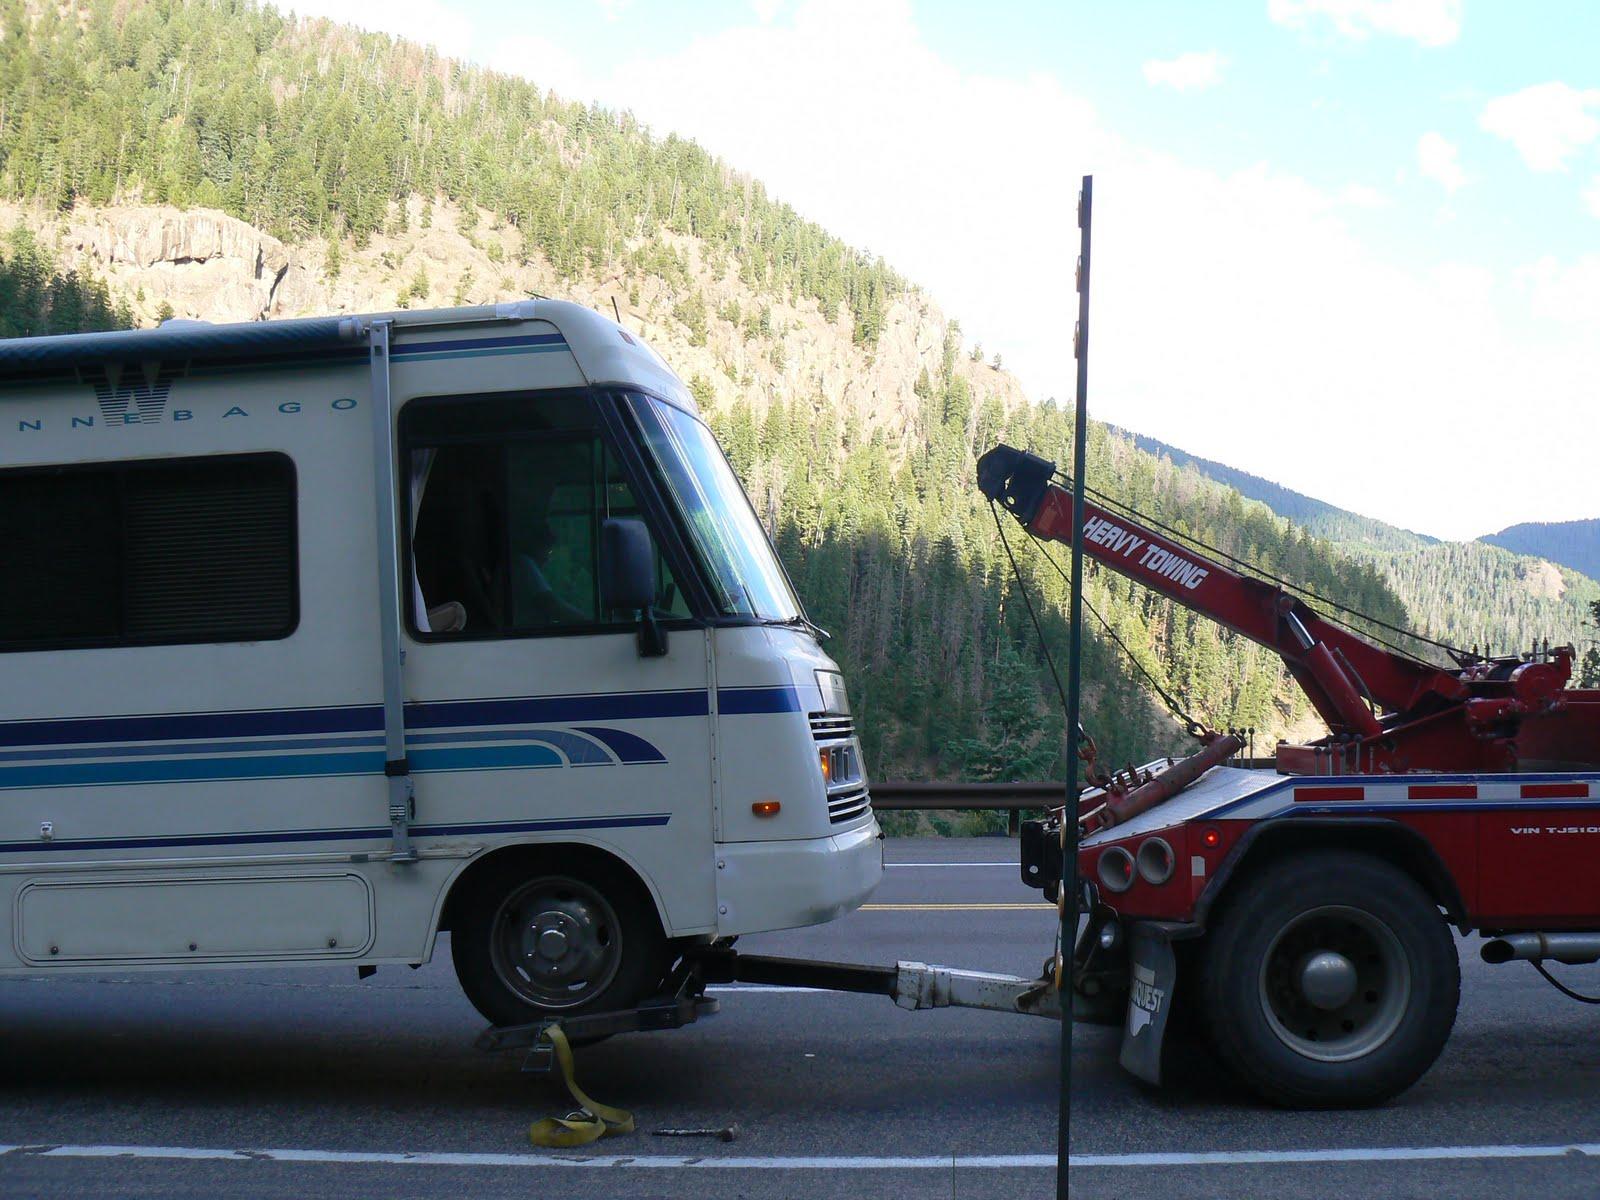 Extended RV Warranties through Fun Motors